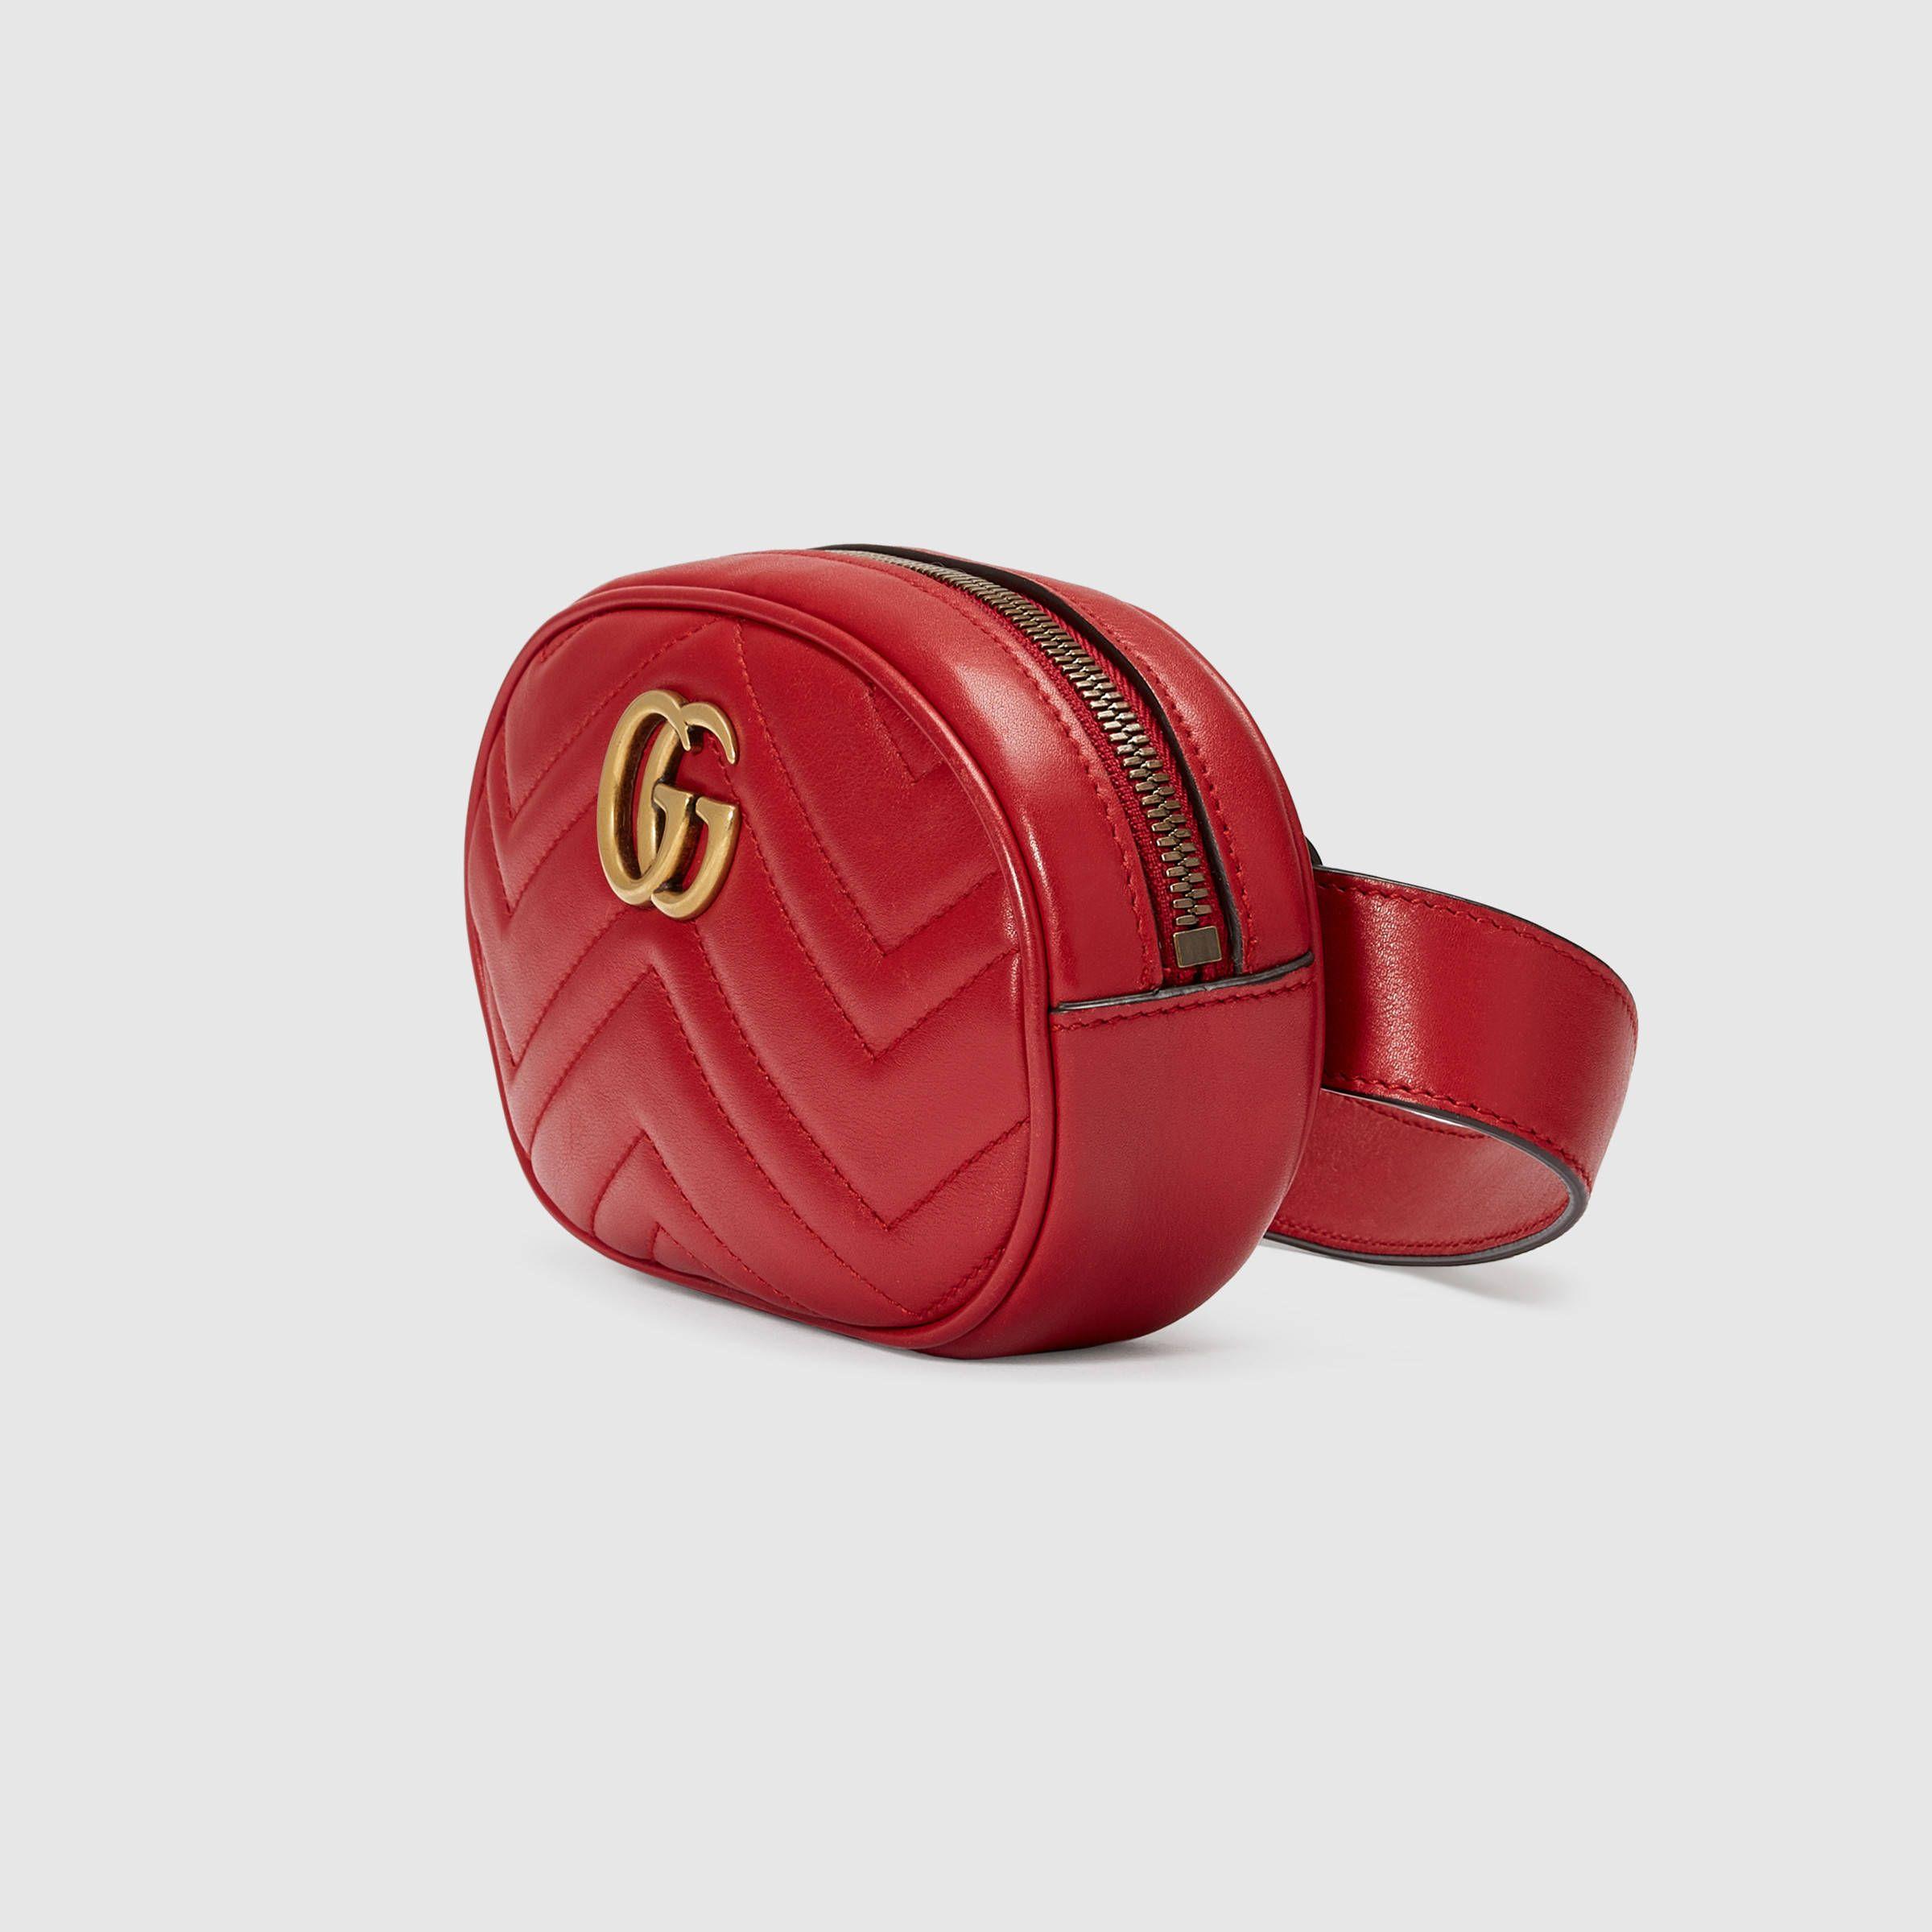 af656167226c GG Marmont matelassé leather belt bag | closet wish list | Leather ...